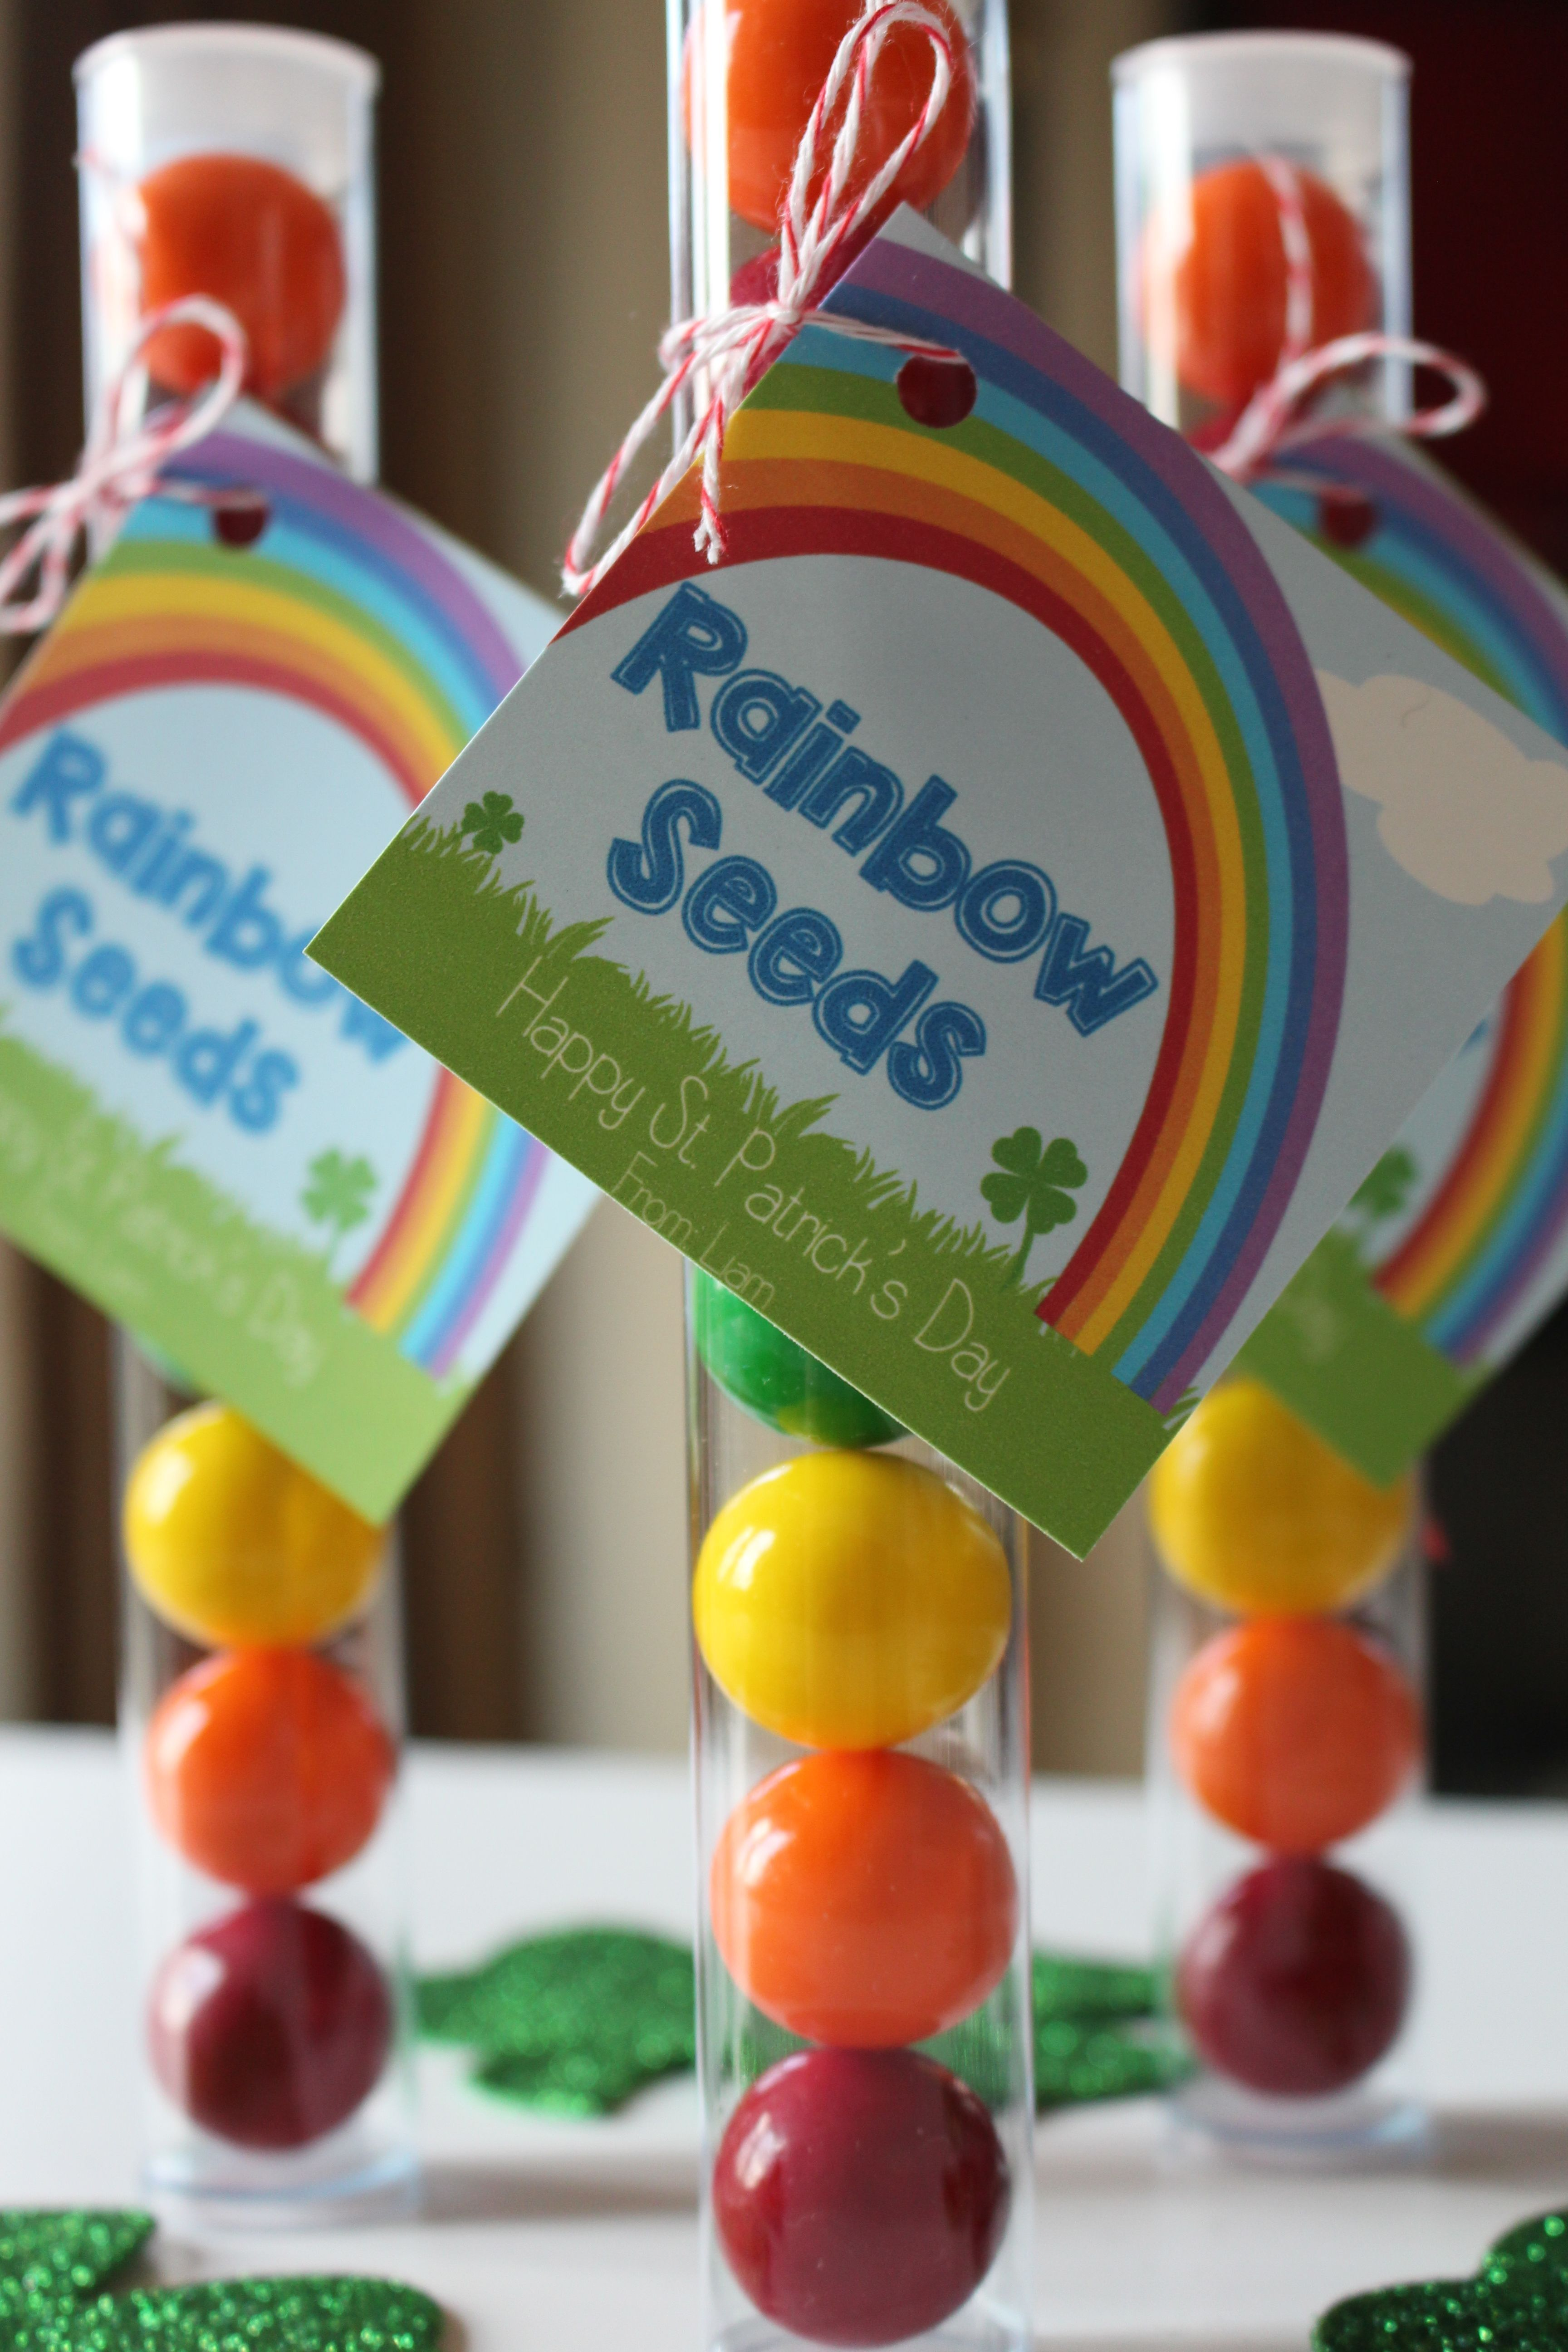 Homemade gift ideas for kids birthday party st patricks